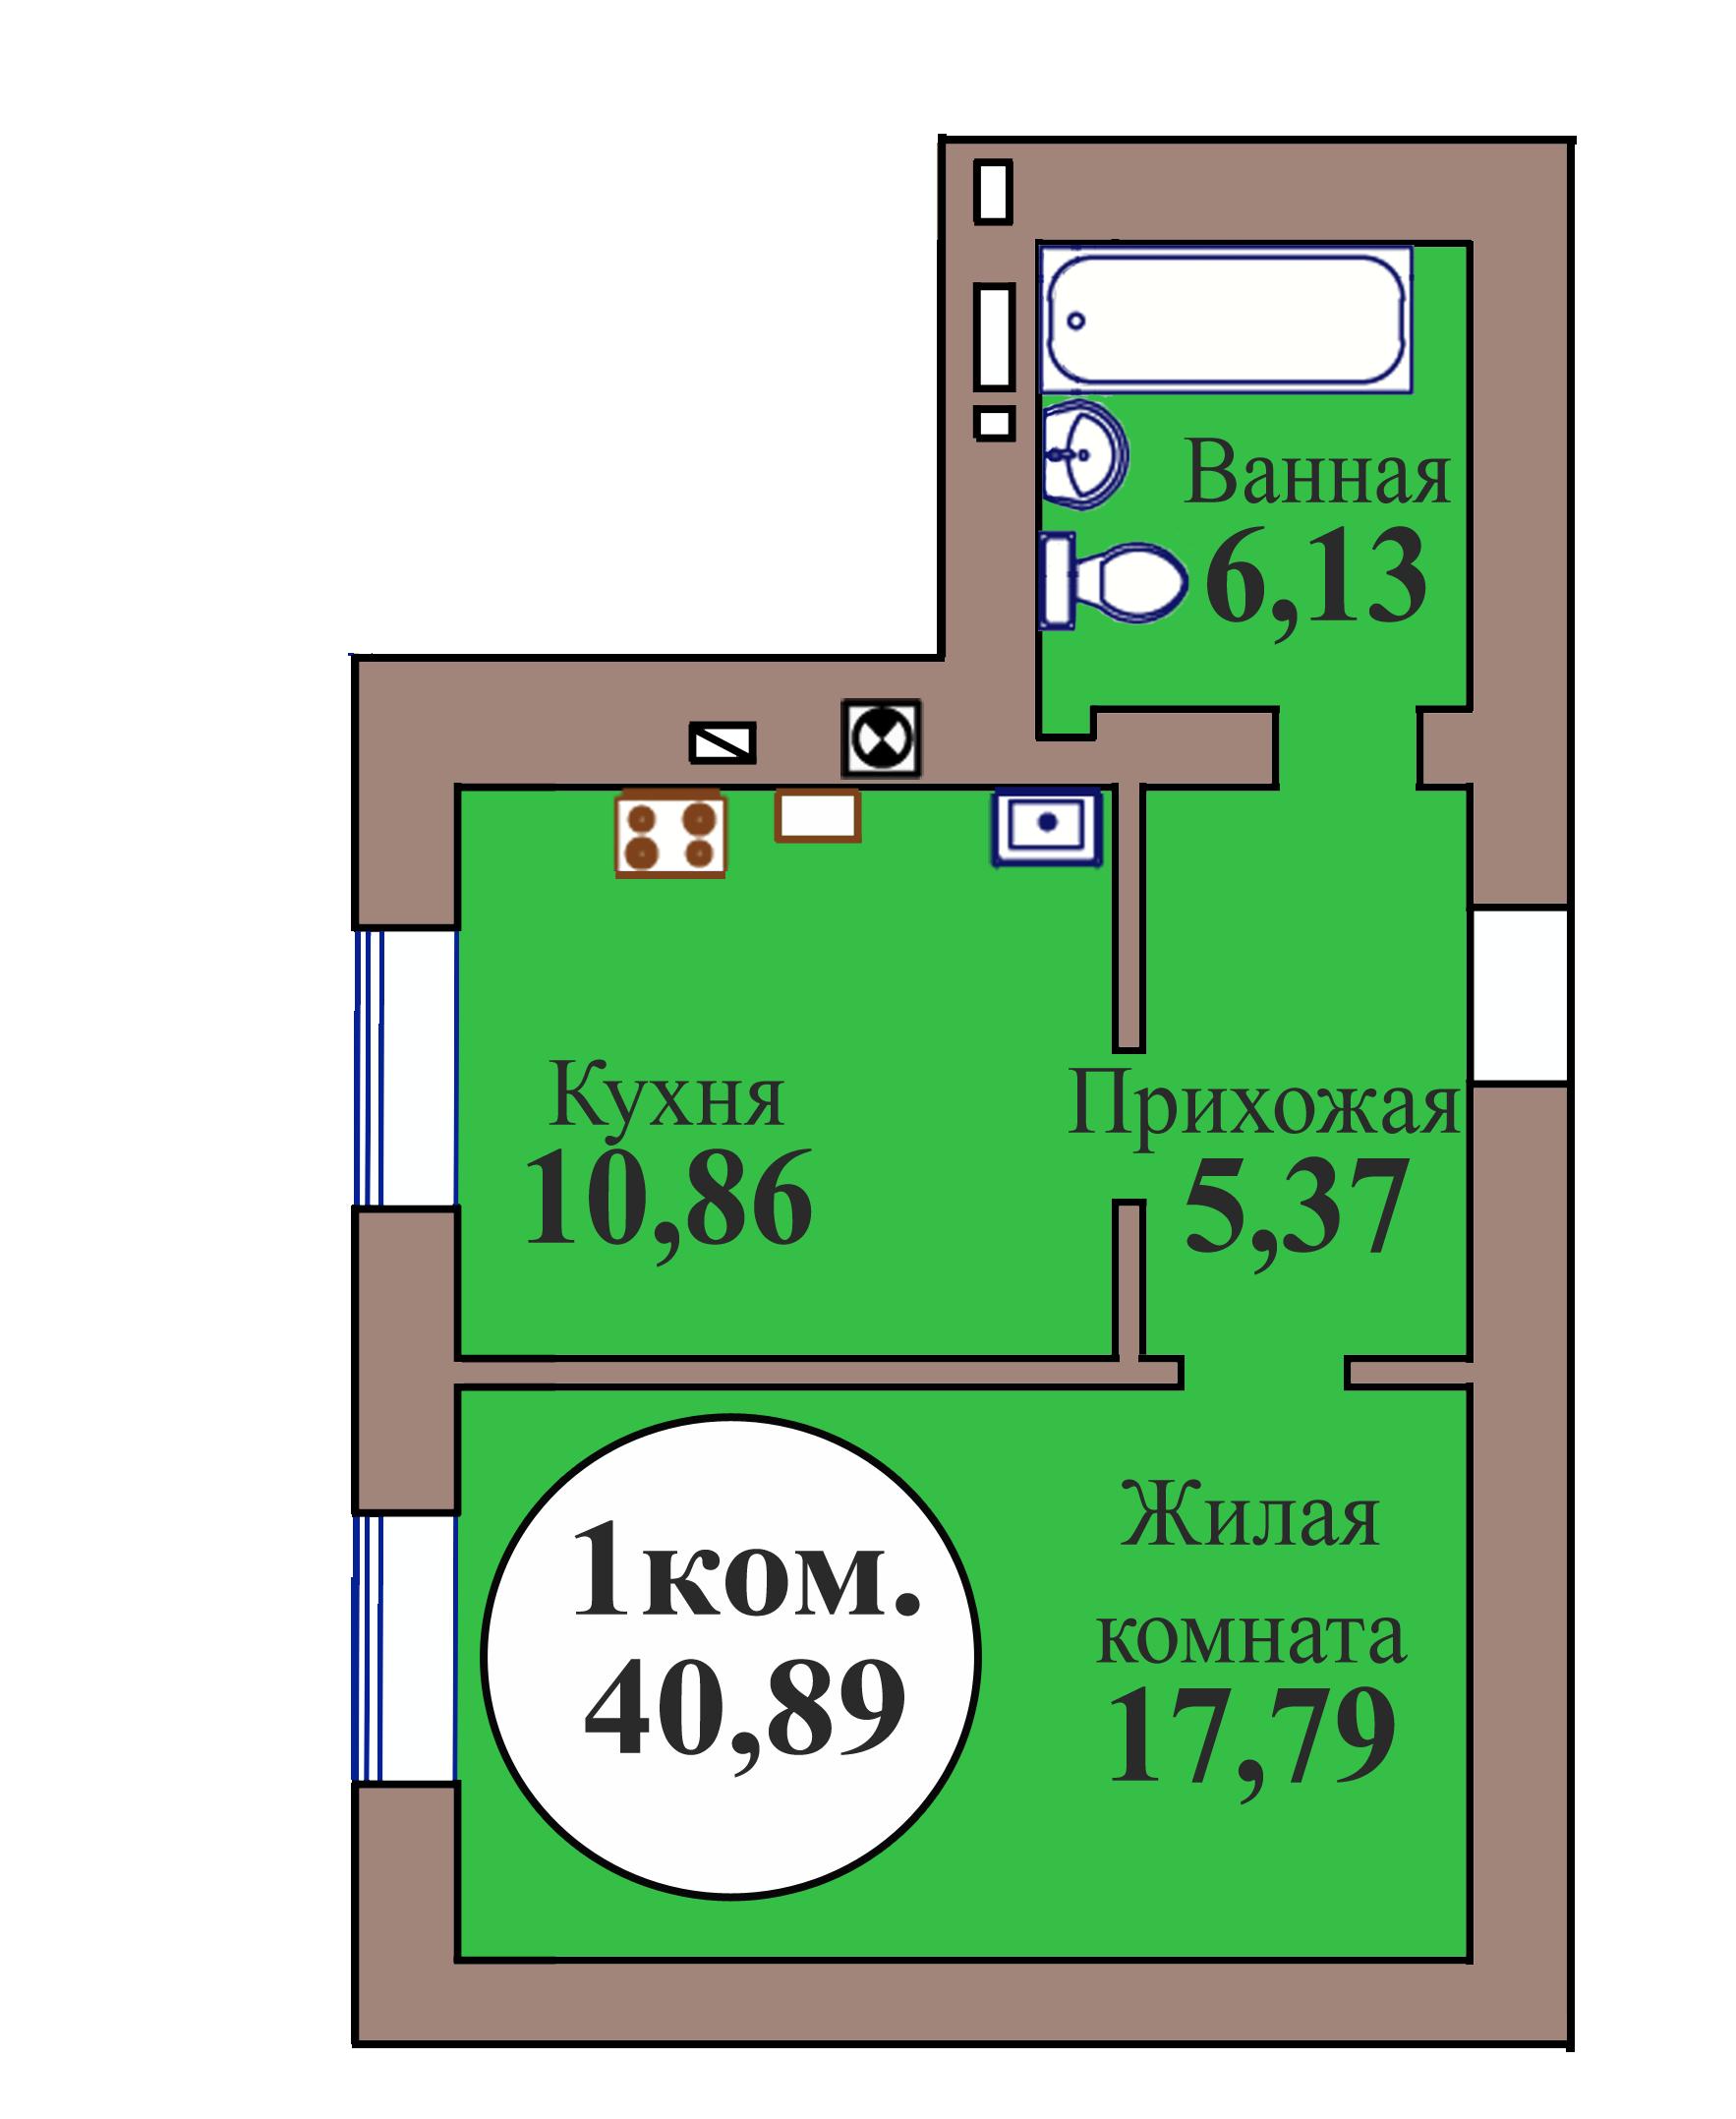 1-комн. кв. по пер. Калининградский, 5 кв. 162 в Калининграде